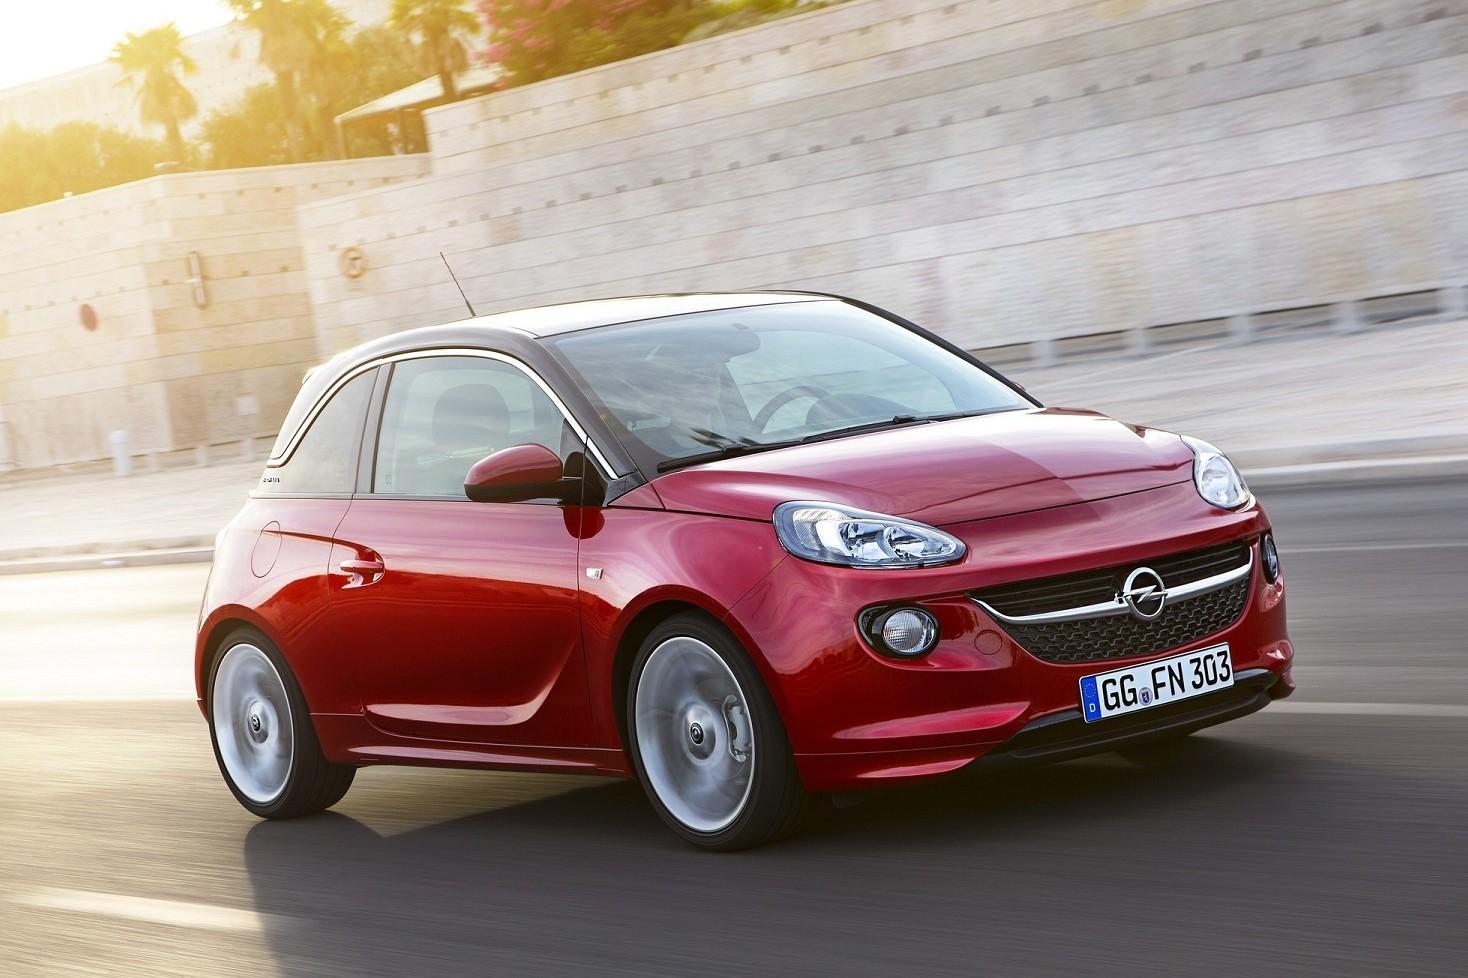 Richiamo Opel Corsa 2019: 210 mila auto